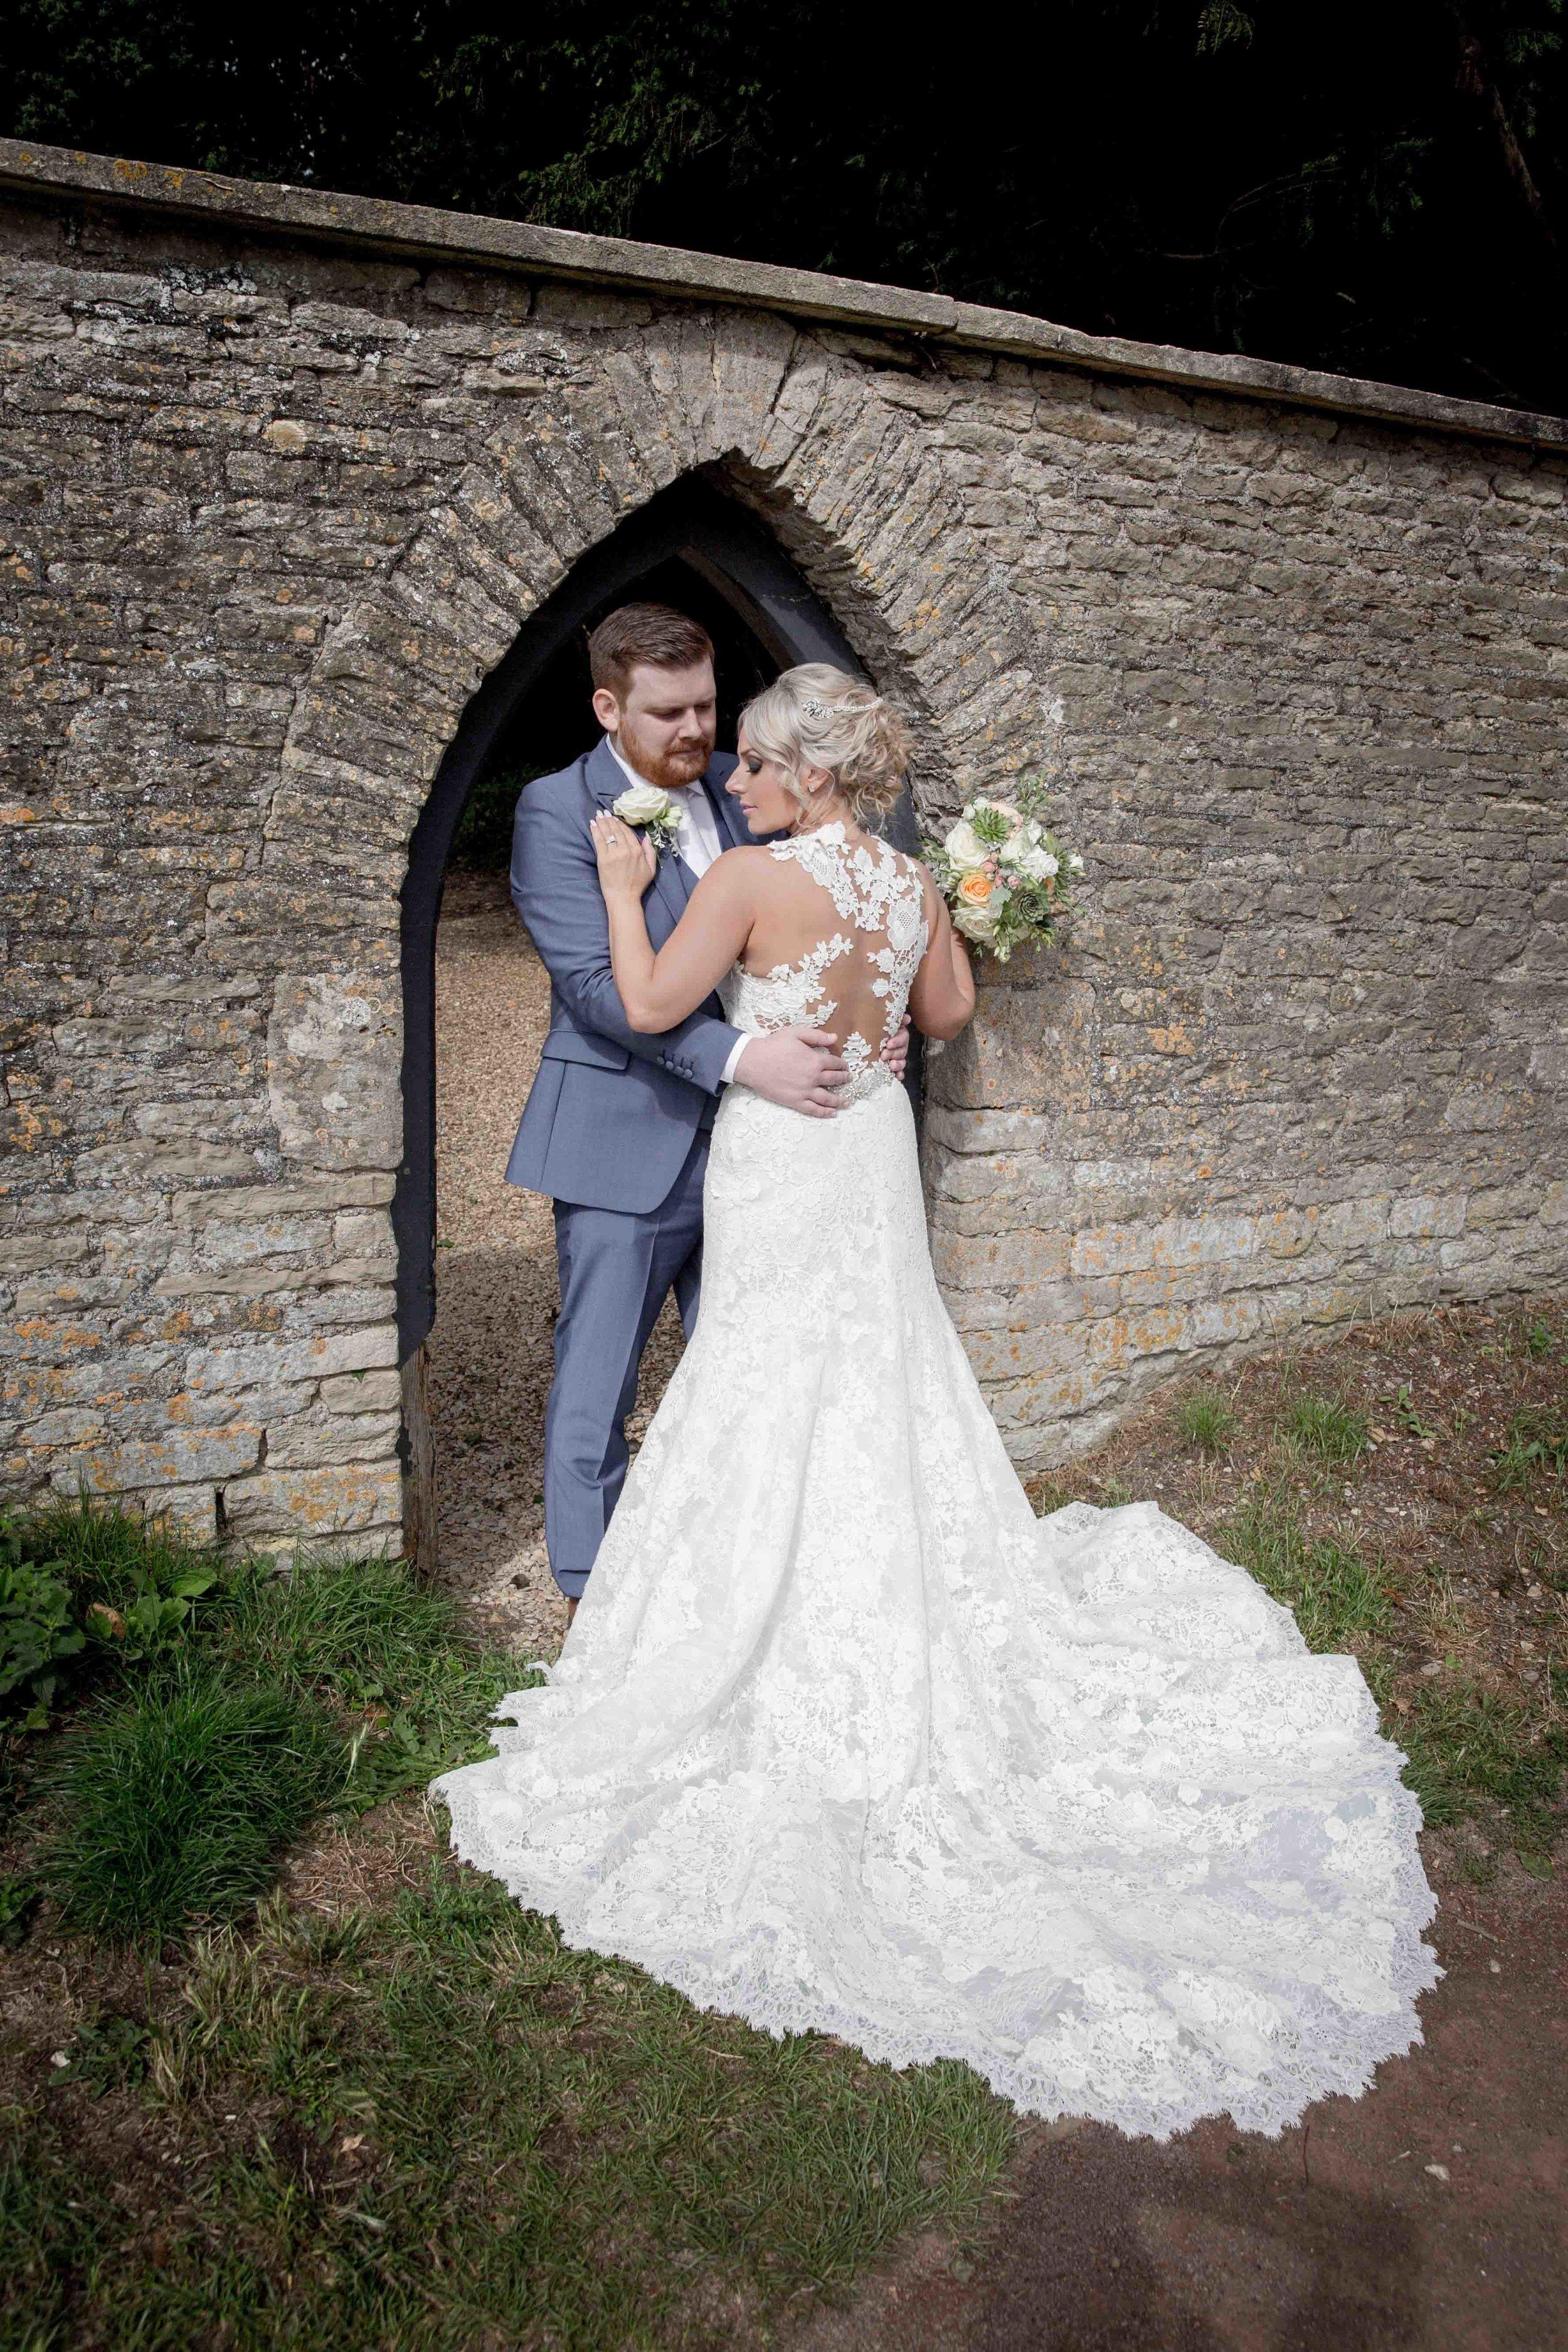 cotswold-wedding-photography-at-stonehouse-court-hotel-natalia-smith-photography-gloucestershire-wedding-photographer-68.jpg